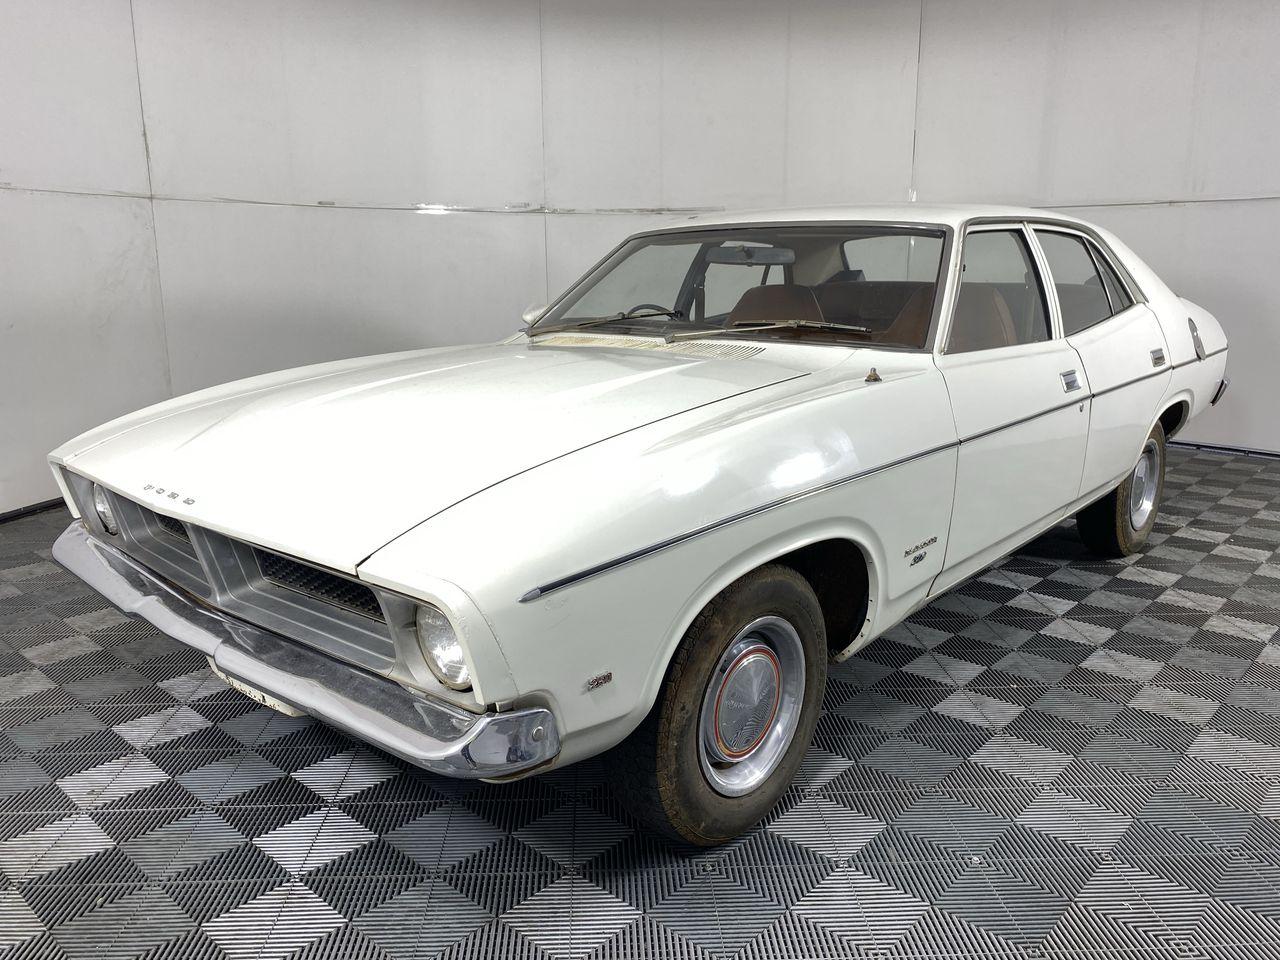 1975 Ford Falcon Automatic Sedan